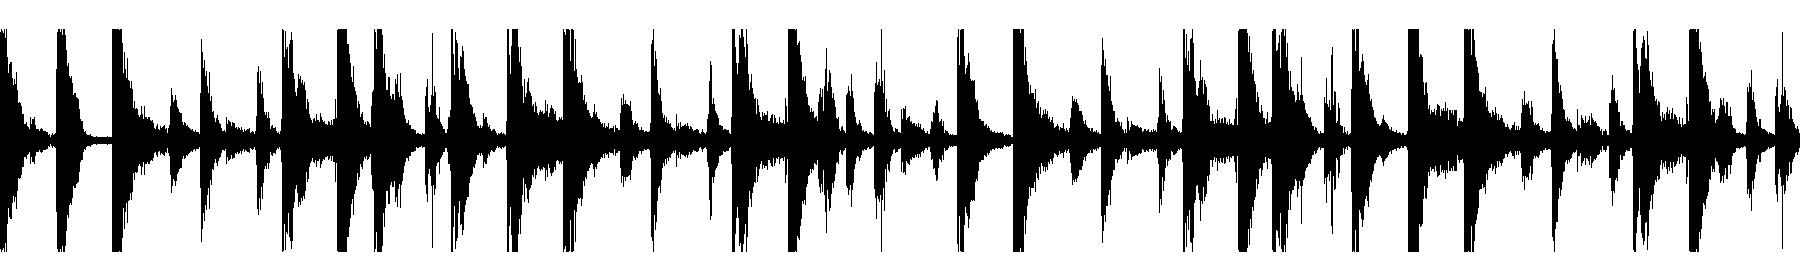 89 sandrobreak sp